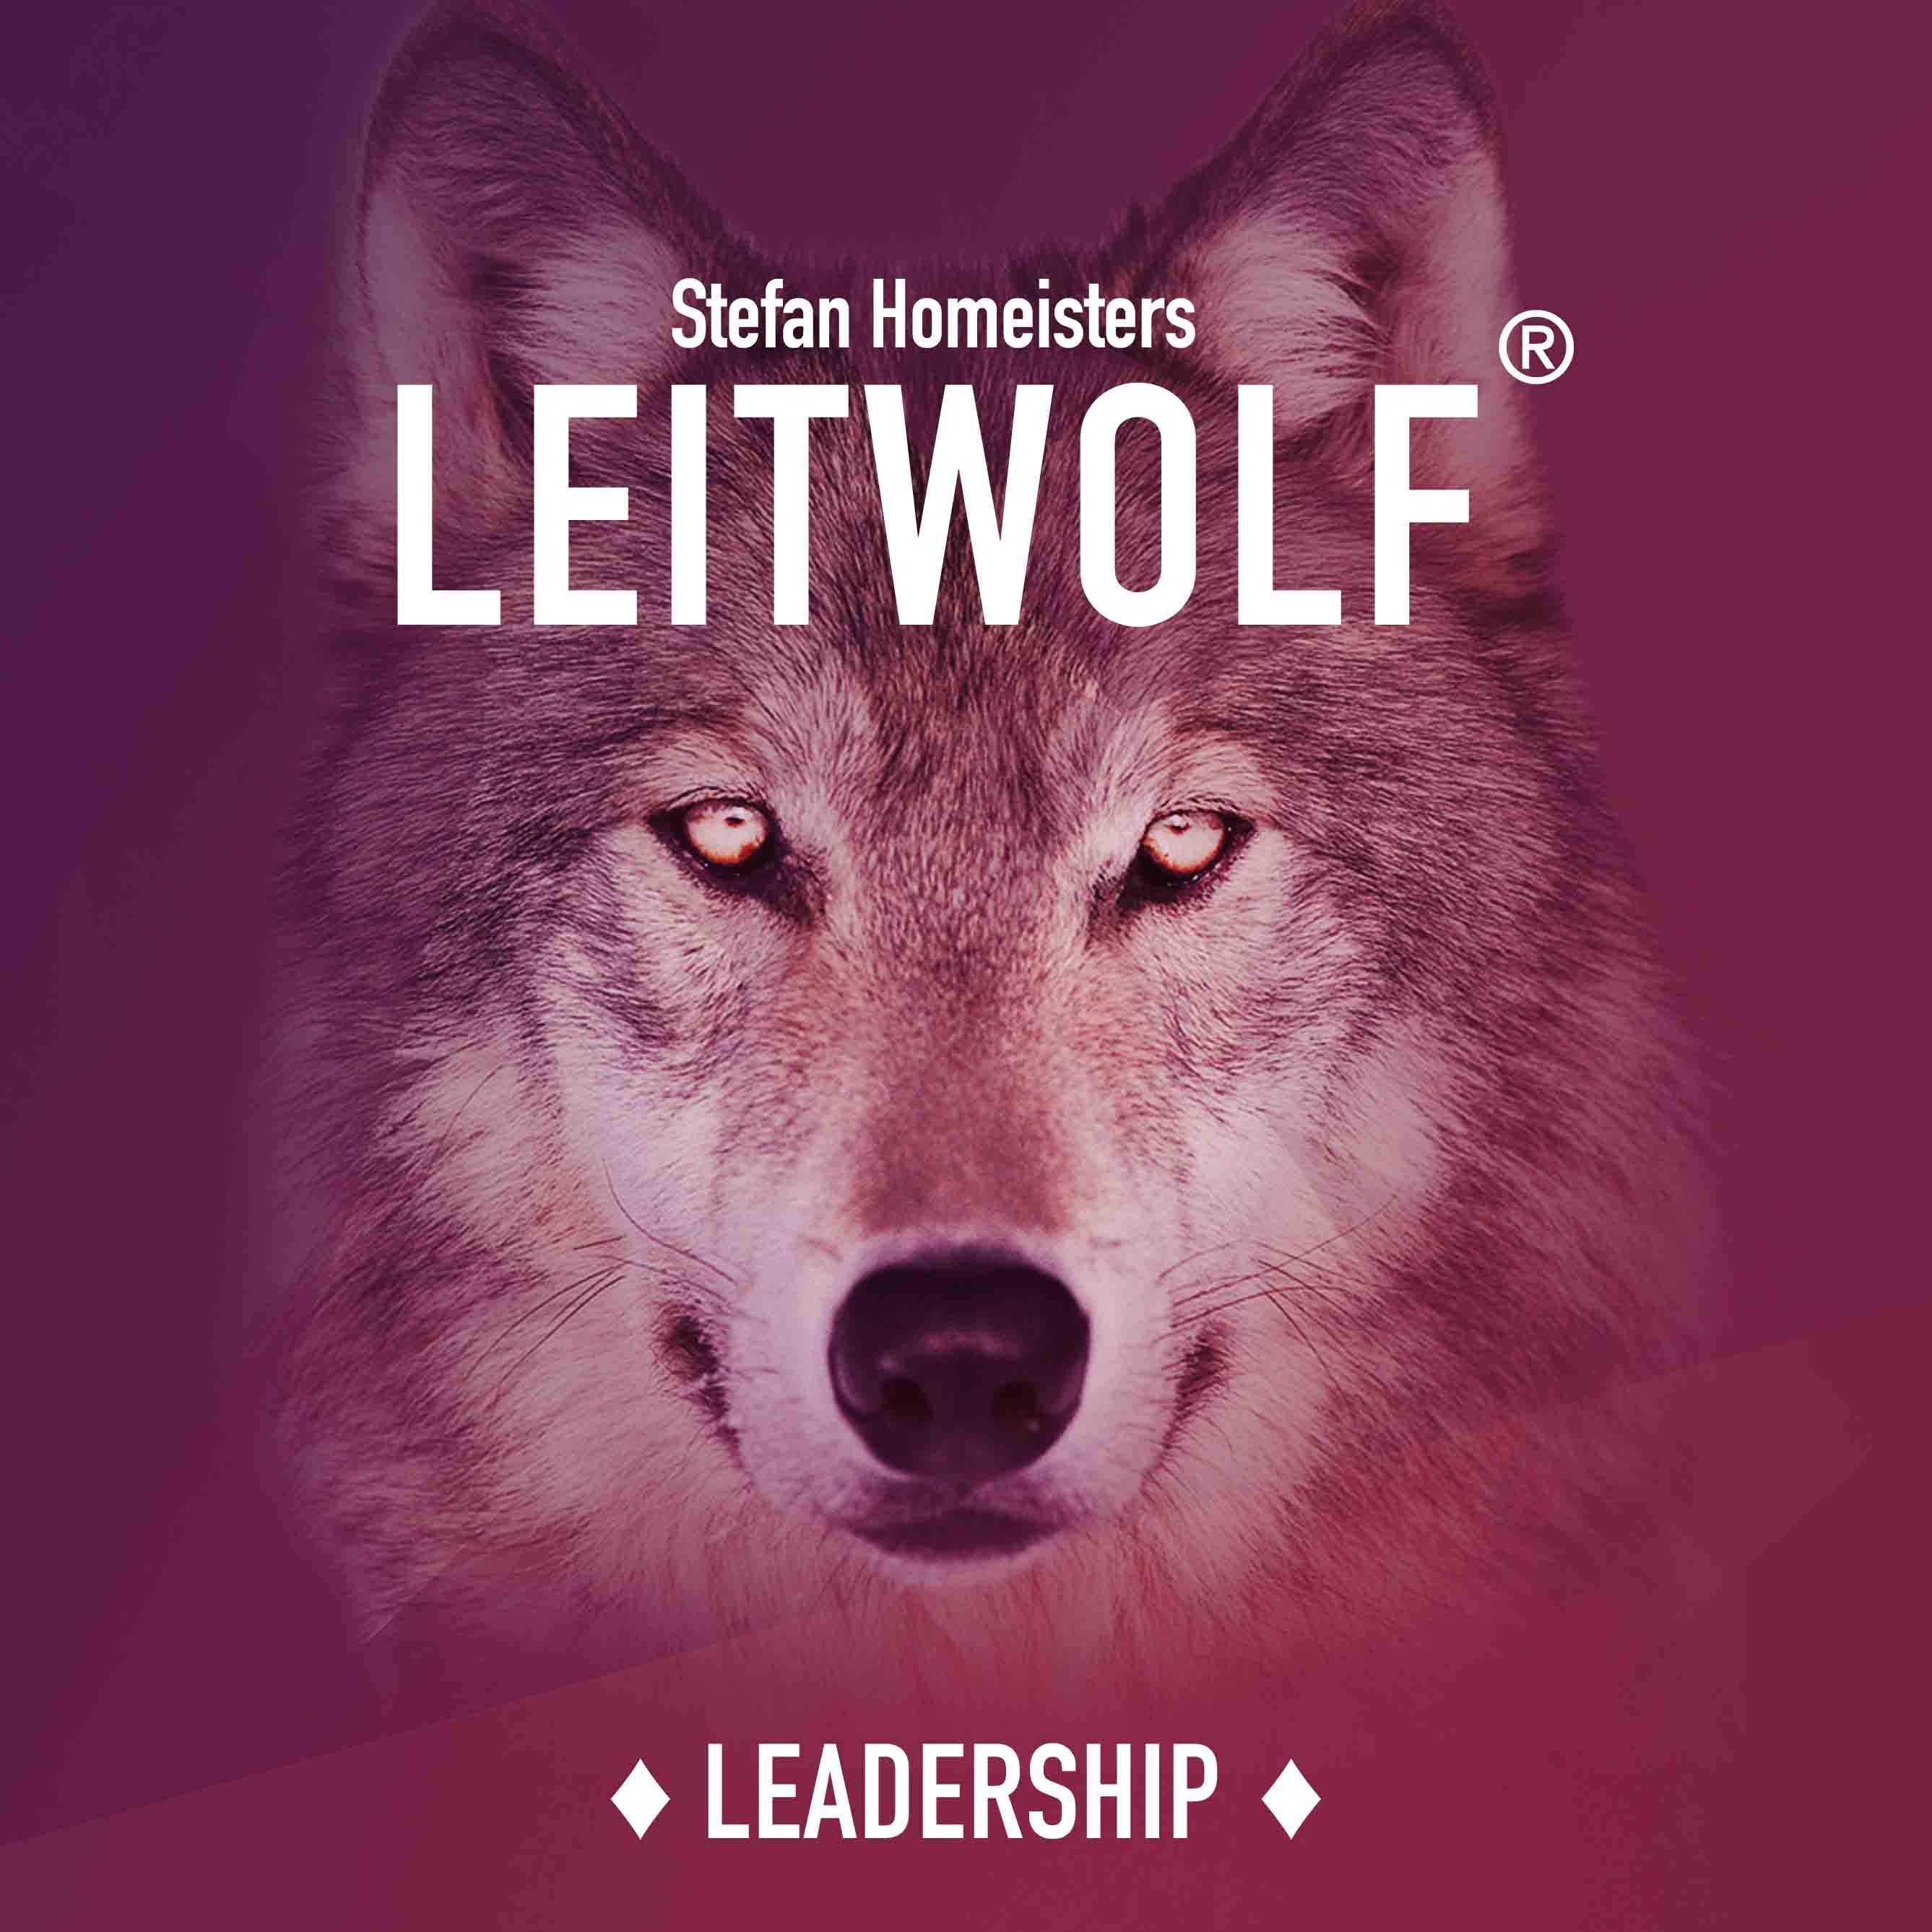 LEITWOLF Podcast - Leadership, Führung & Management show art